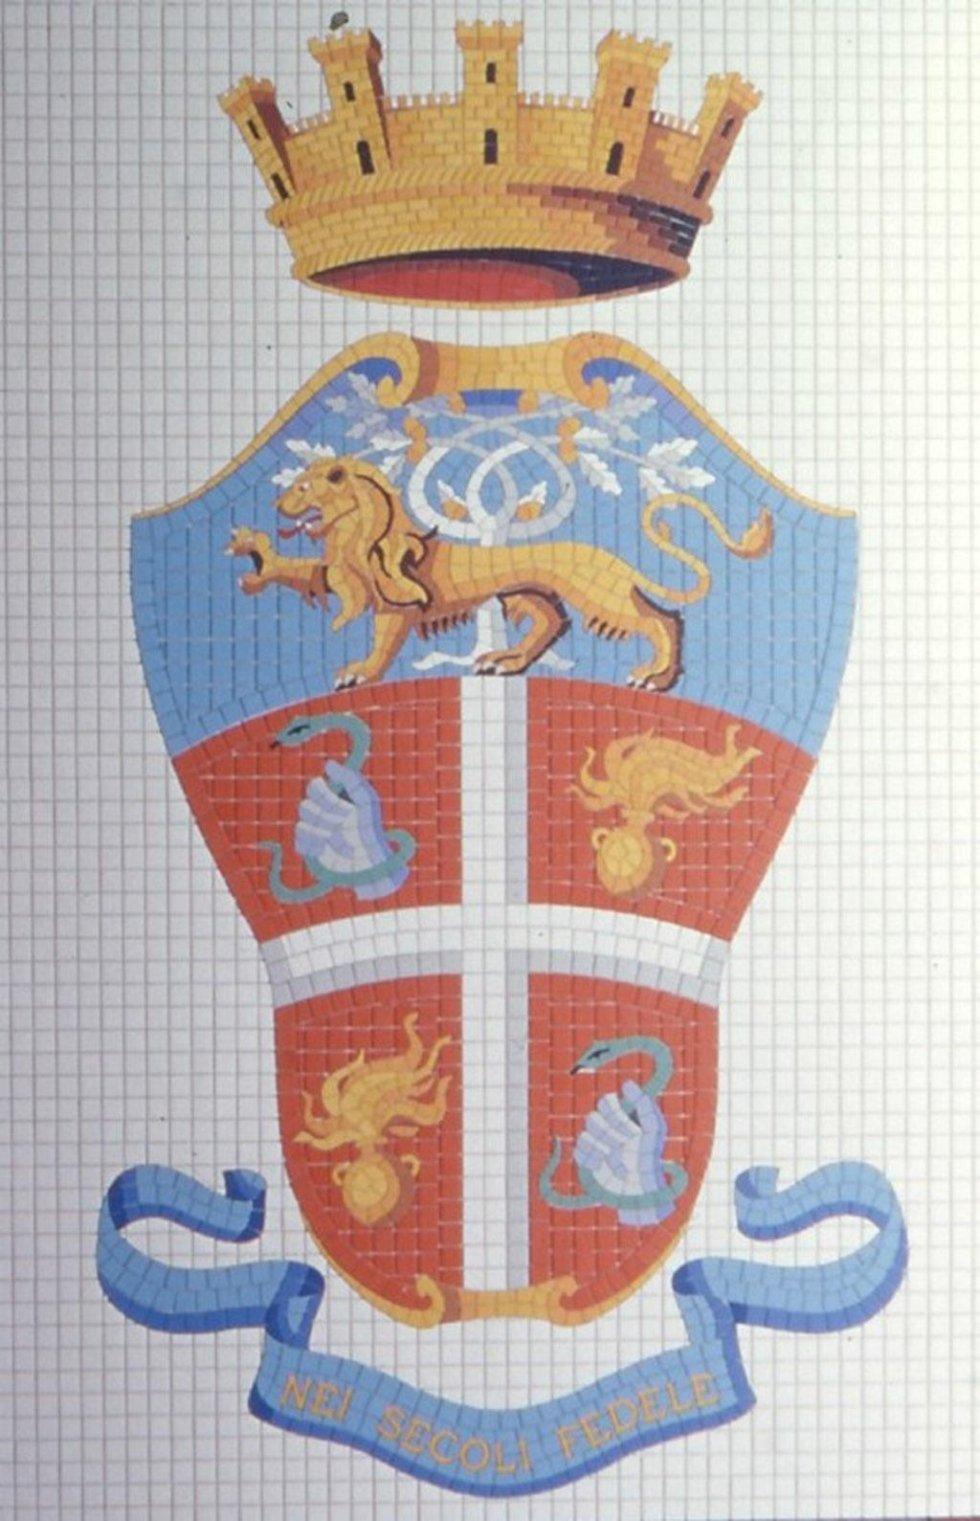 Stemma Carabinieri